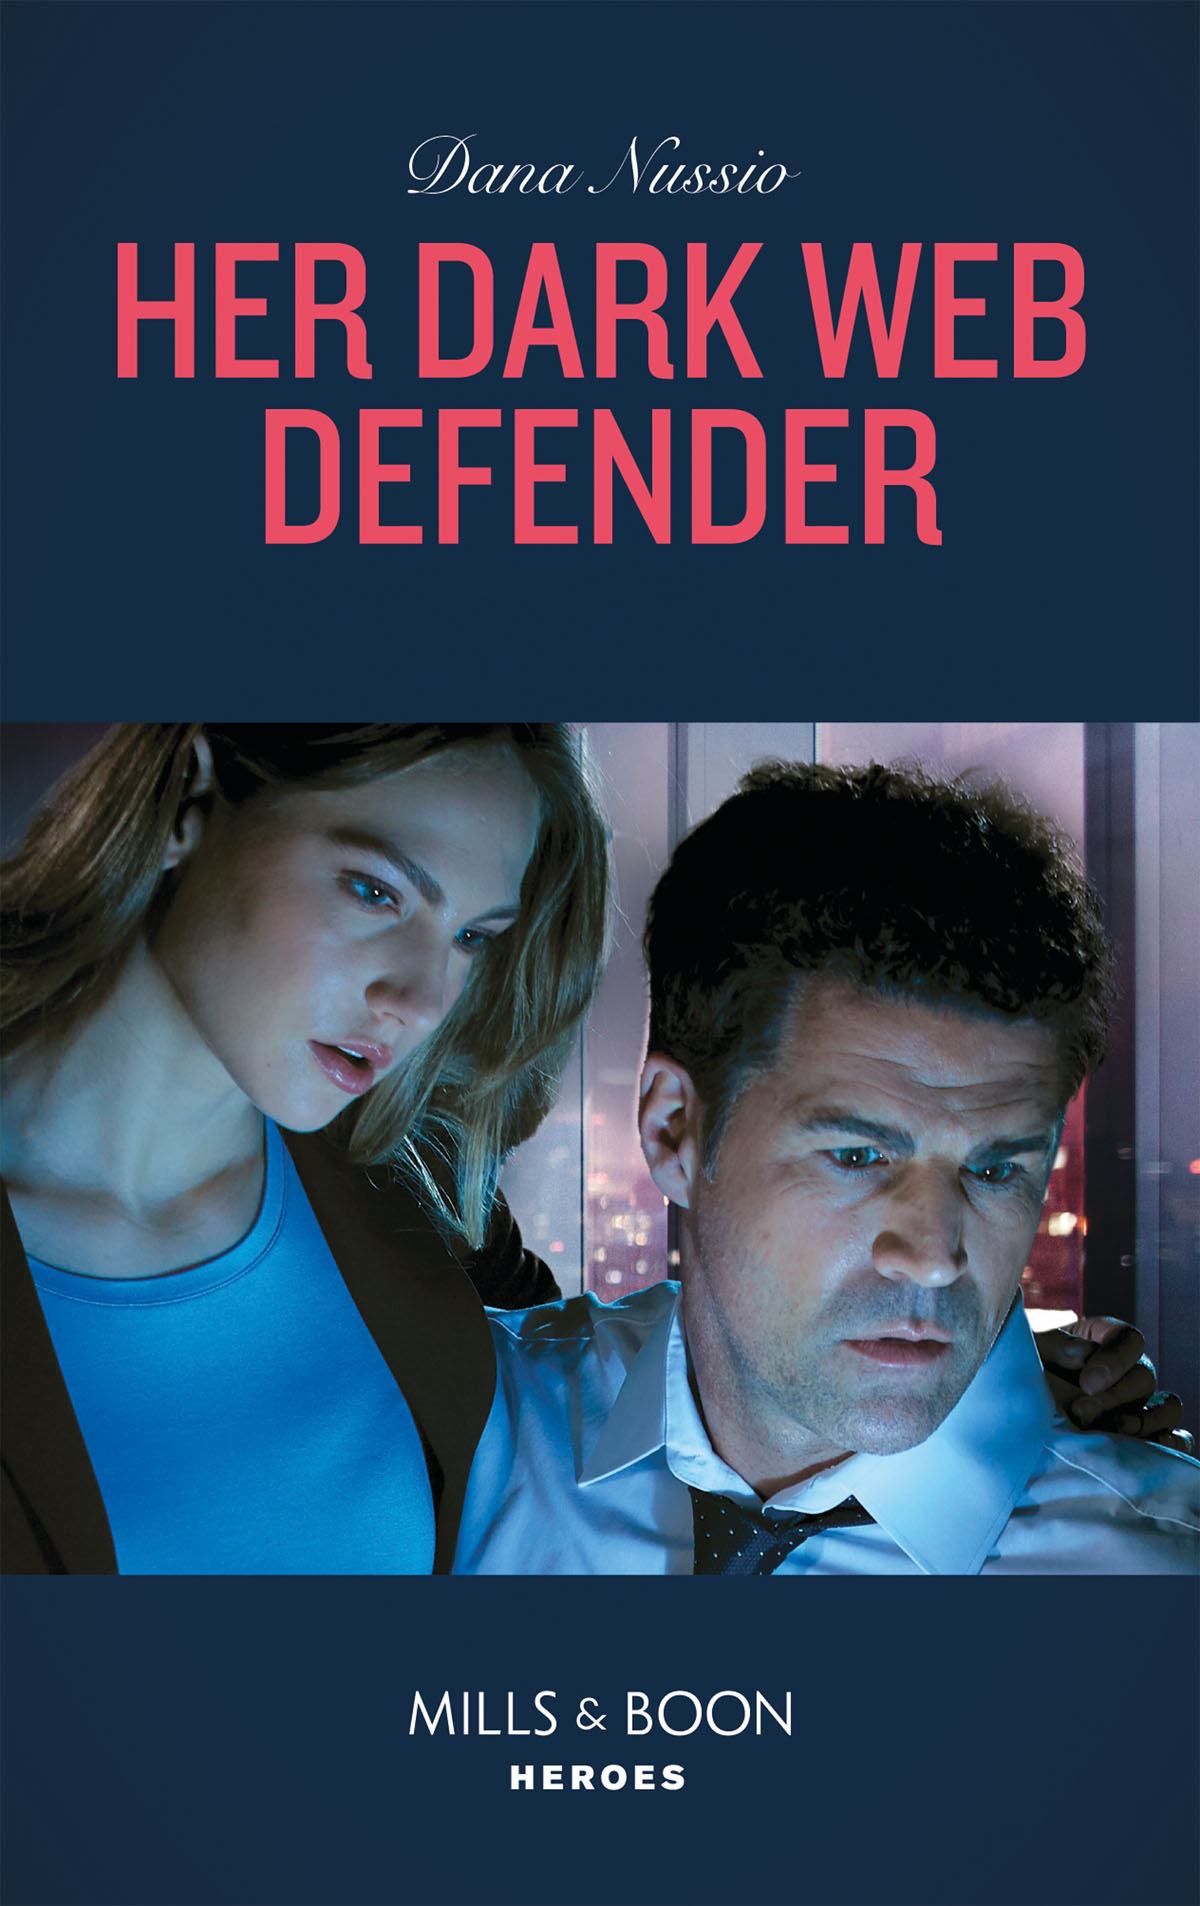 Dana Nussio Her Dark Web Defender beth cornelison tall dark defender